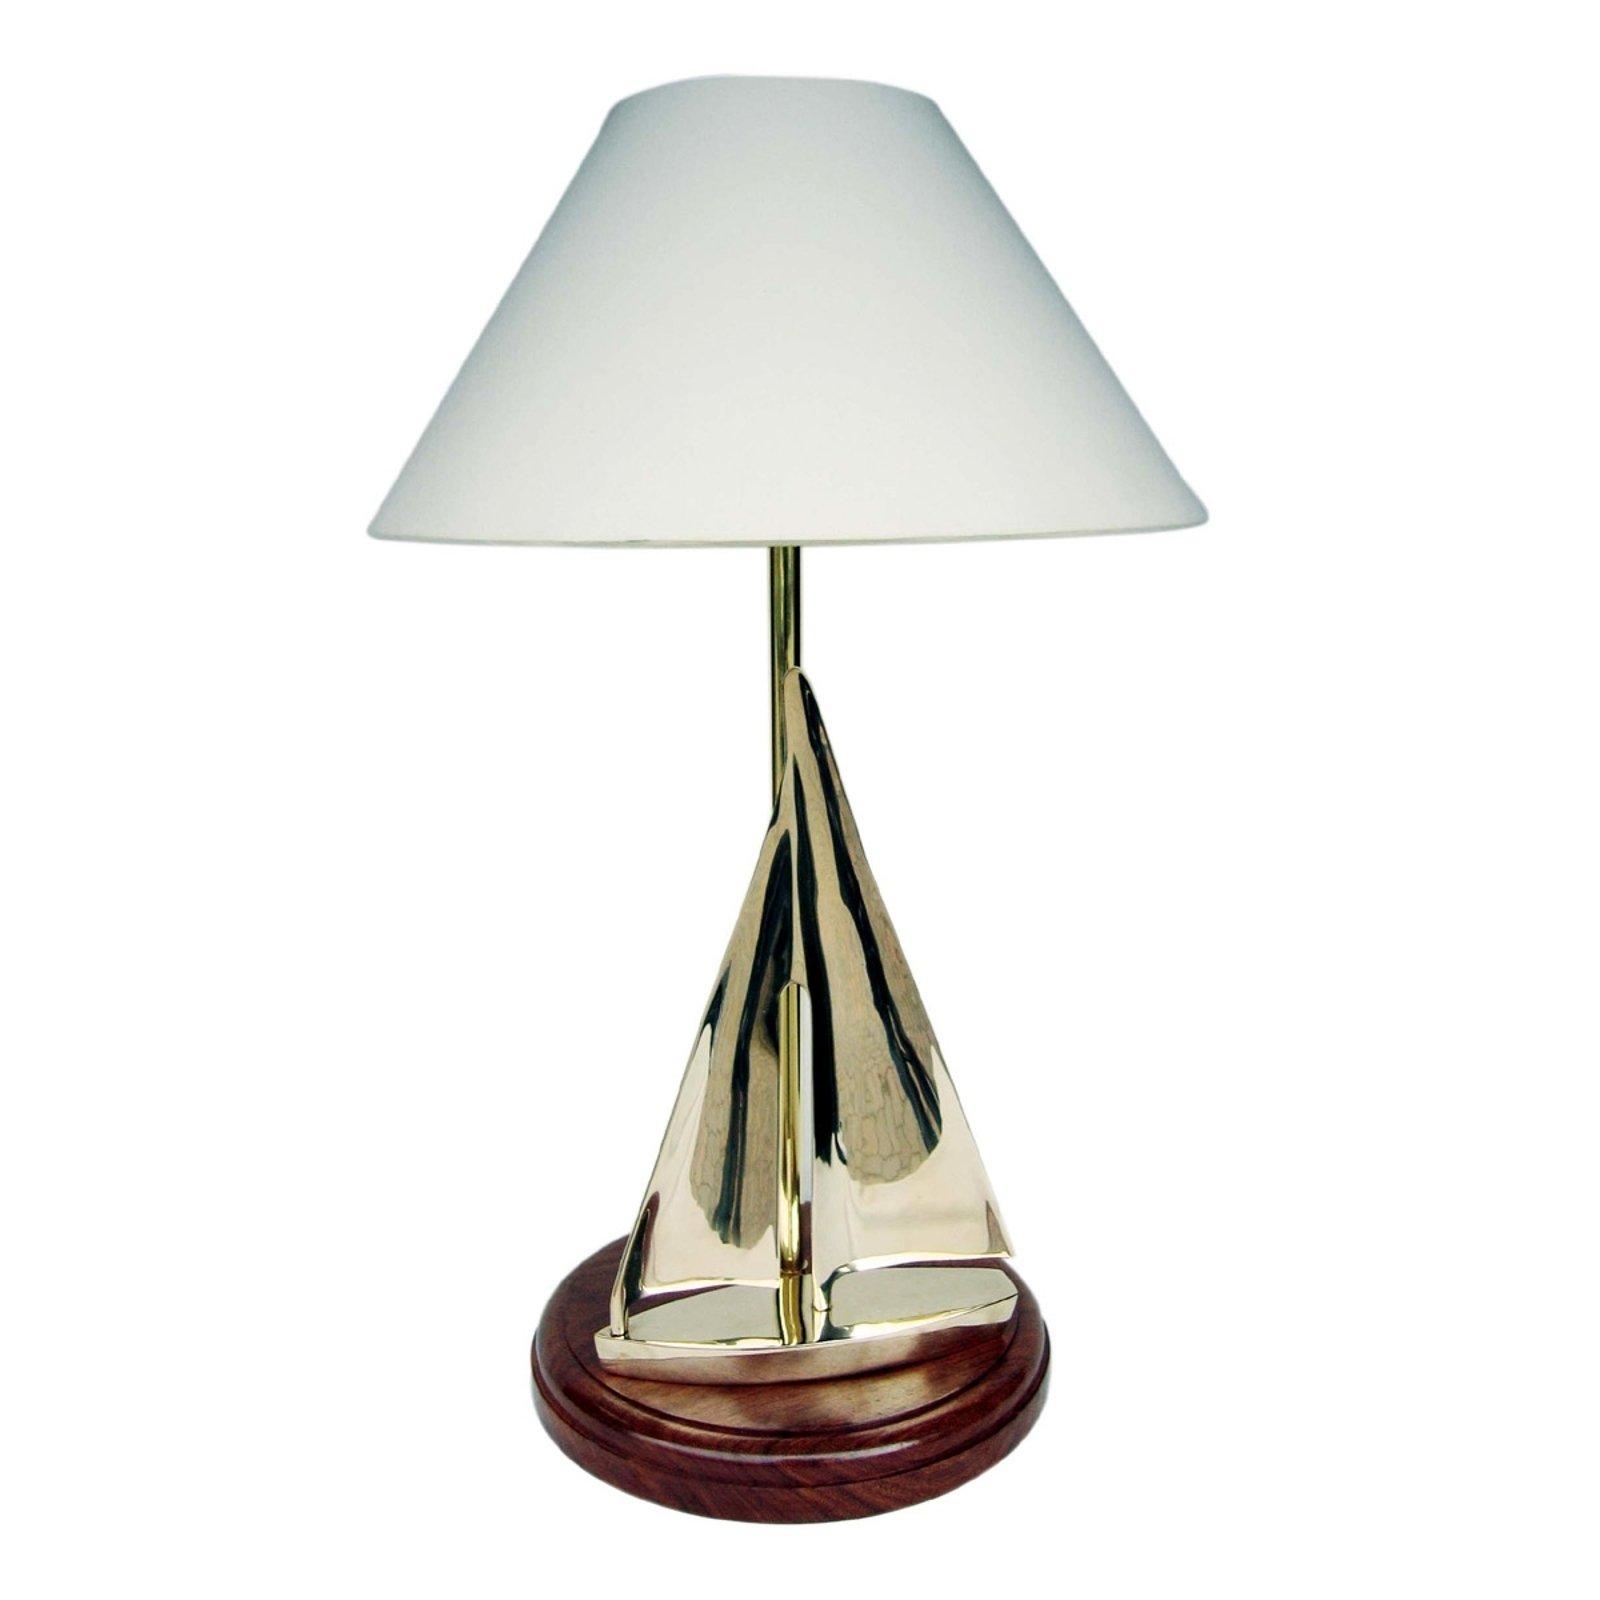 Iøynefallende bordlampe SAILING, 60 cm høy